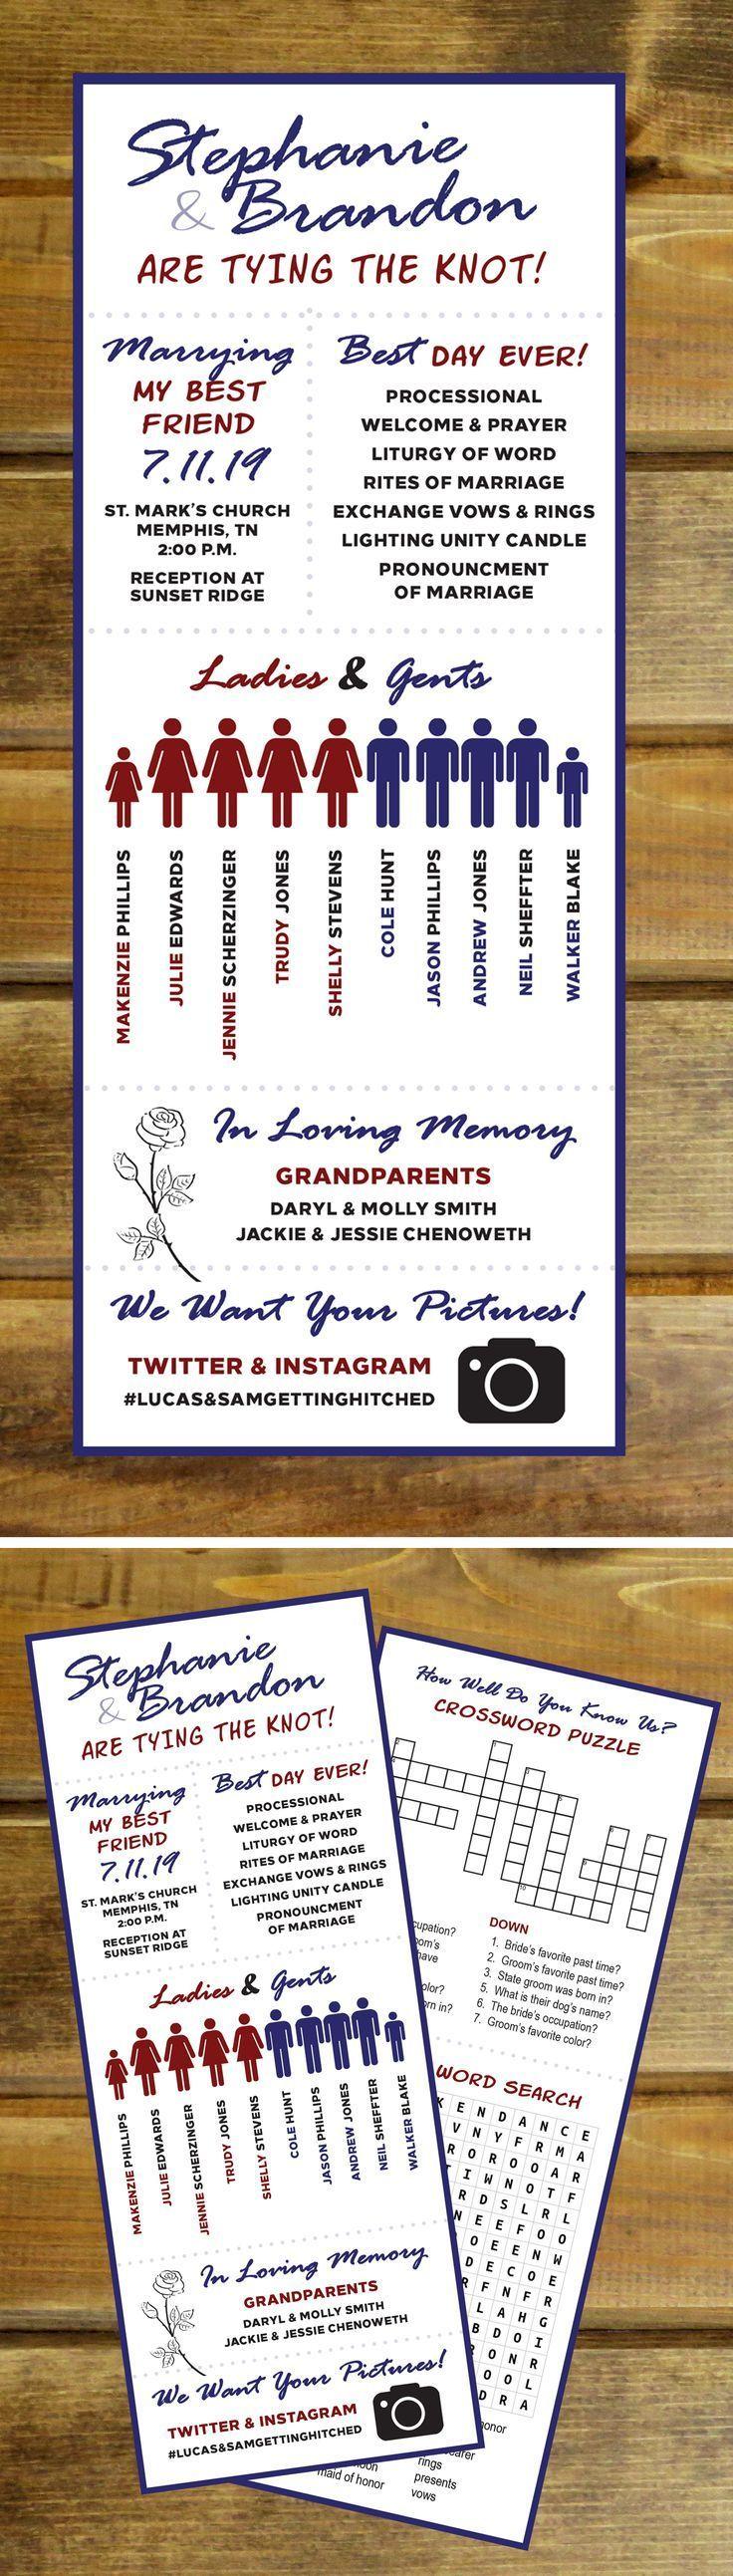 Fun Modern Infographic Wedding Program With Crossword Puzzle Etsy Wedding Infographic Modern Wedding Program Wedding Programs